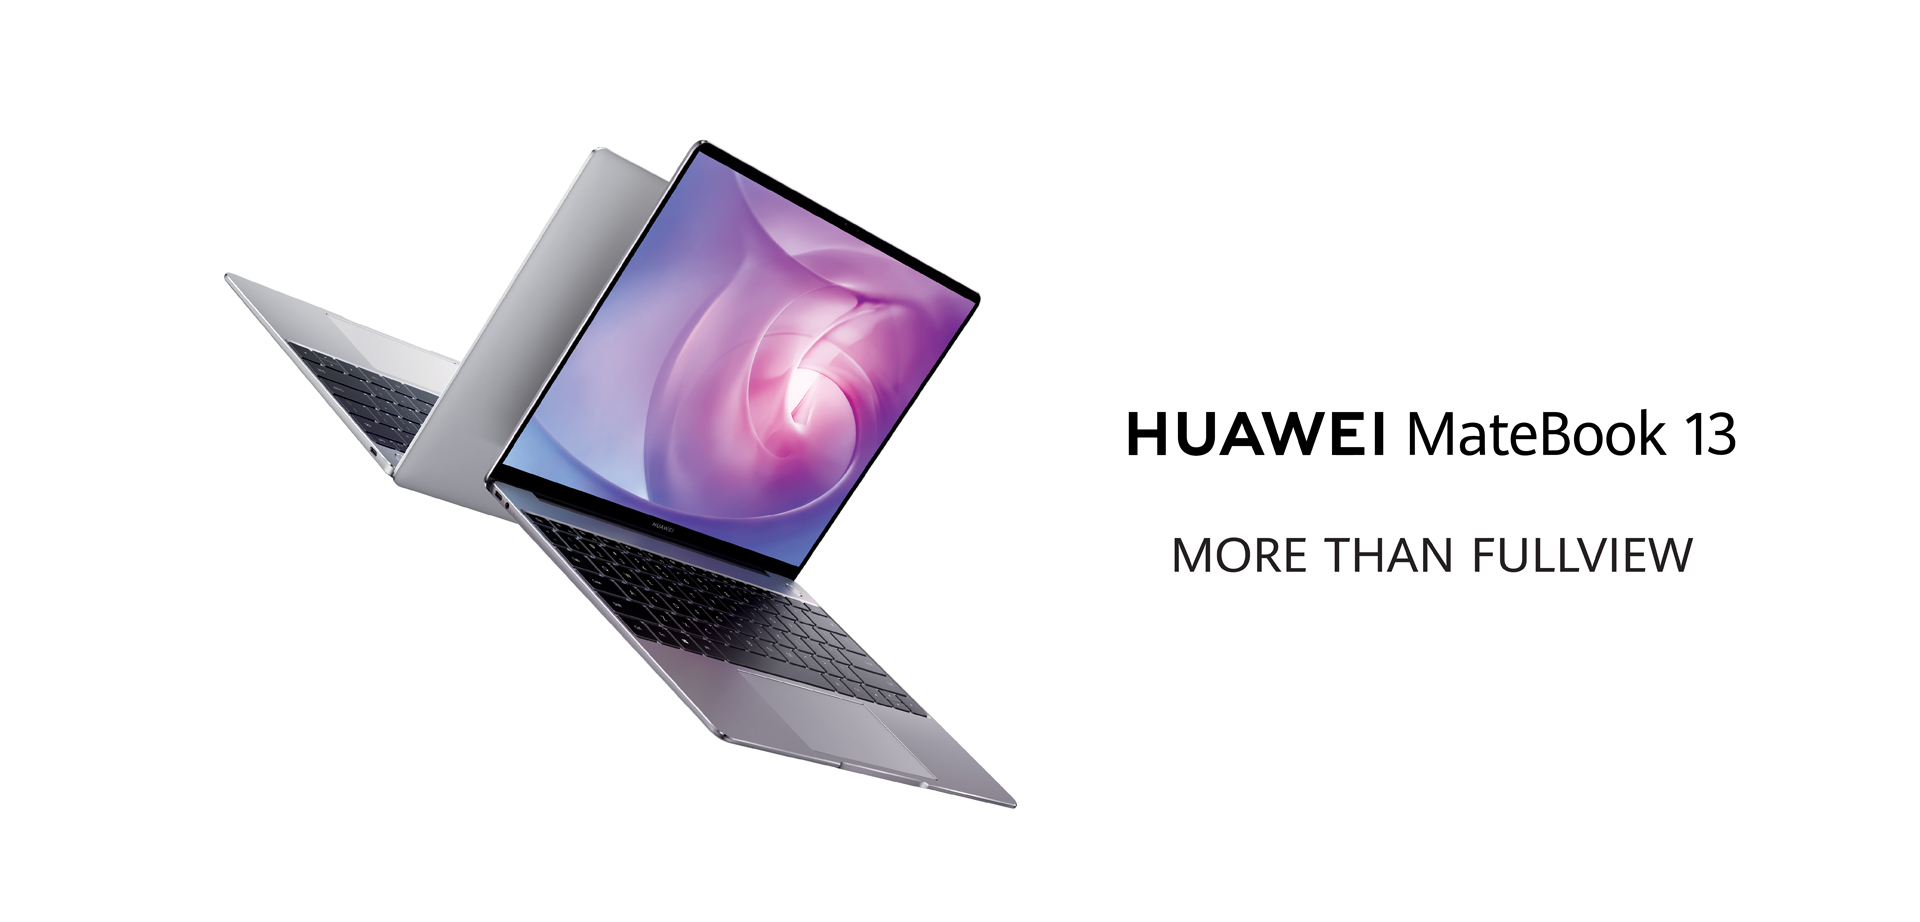 Huawei Matebook 13 Laptop Intel Core I7 8565u 13 Inch 512gb Ssd 8gb Ram Eng Arb Kb Windows 10 Space Grey Wr W29 Buy Best Price In Oman Muscat Salalah